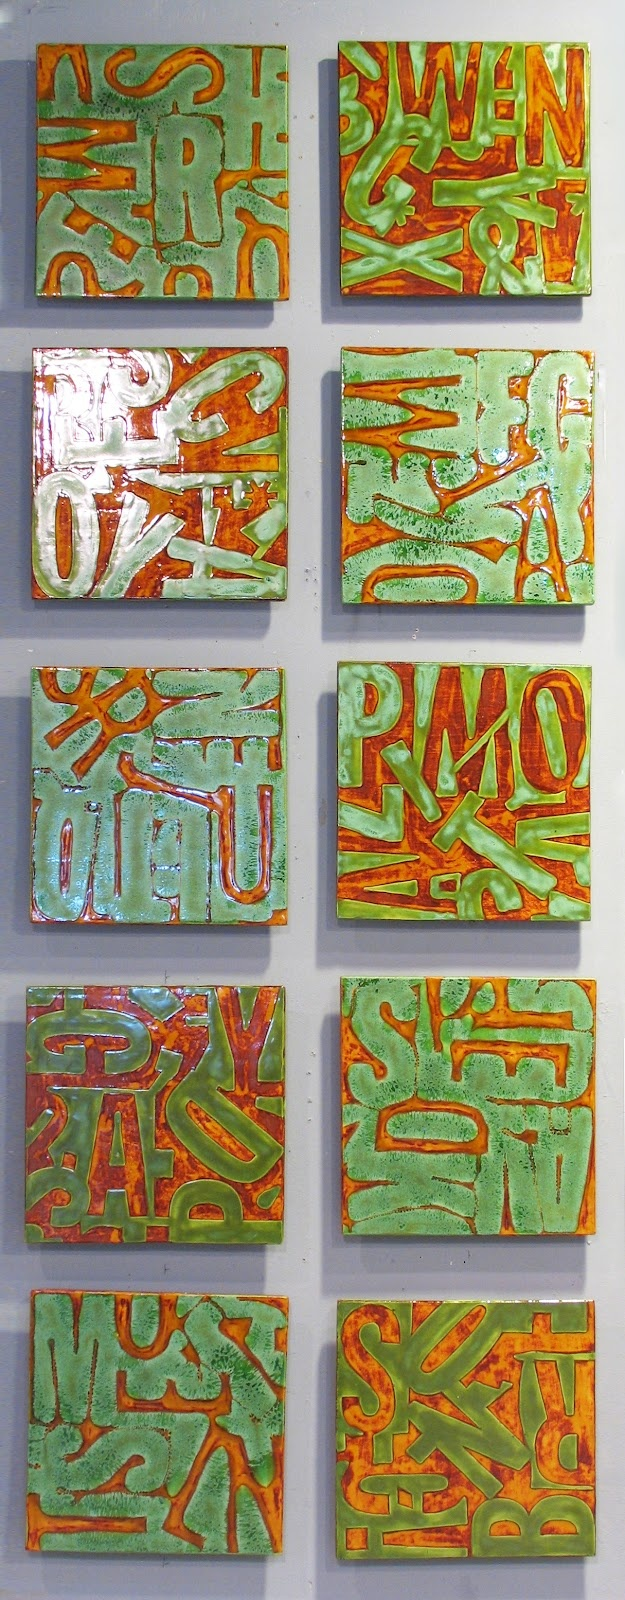 Spring Madrigal - Vertical ceramic wall art tile Murals from JasonMessingerArt.com